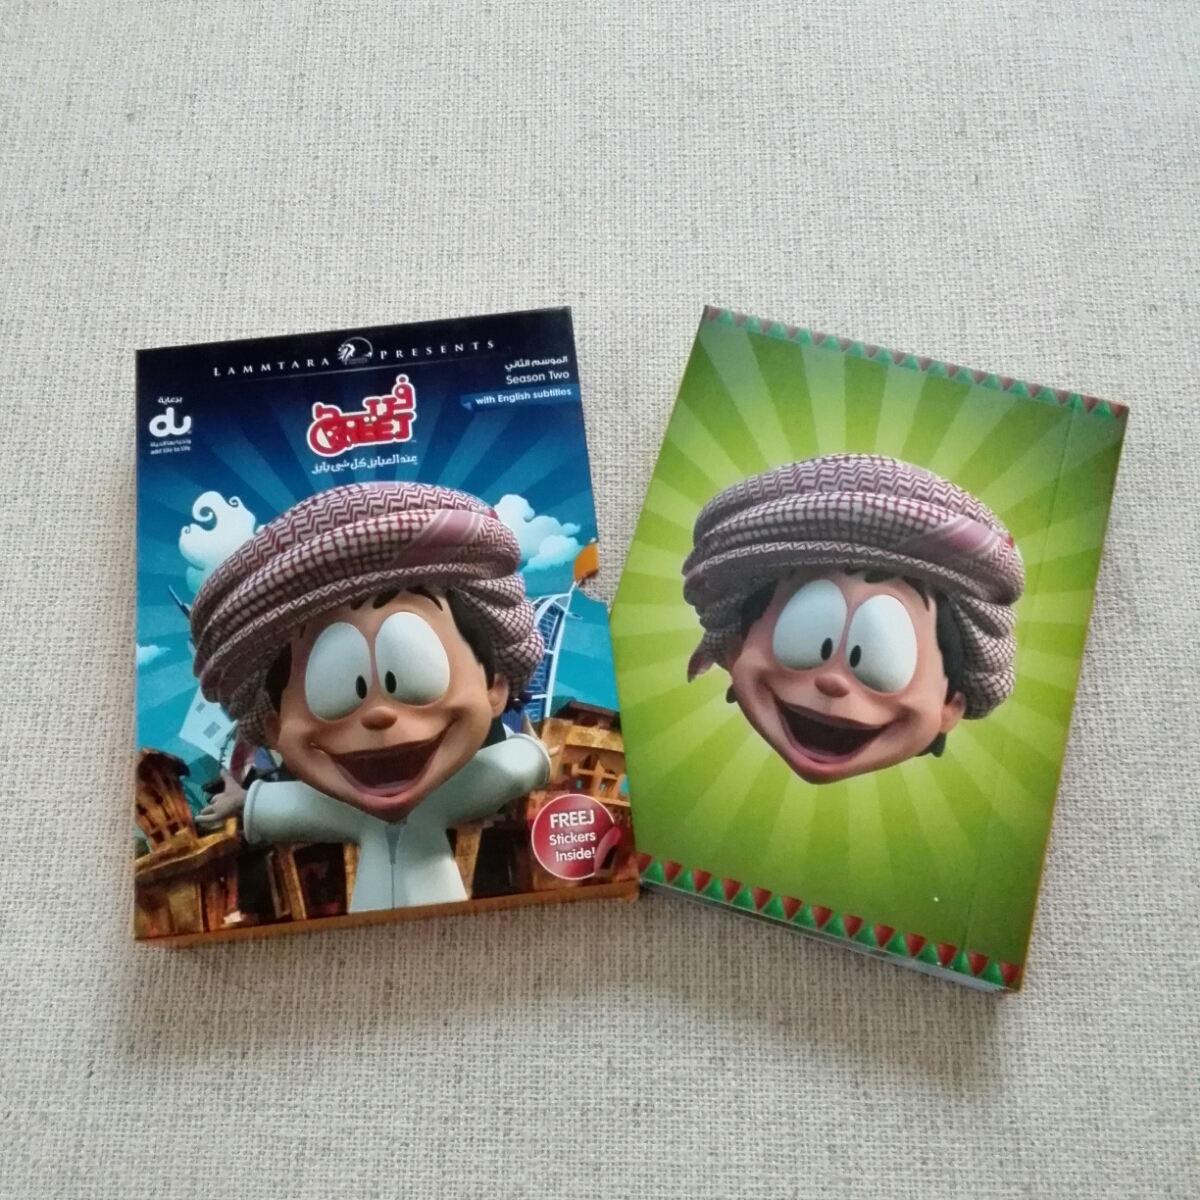 FREEJ フリージ ドバイ 3D アニメ DVD-BOX Season 2 輸入盤 4枚組 U.A.E. Sama Dubai Channel 英語字幕 モハメッド サイード ハリブ アラブ_画像1